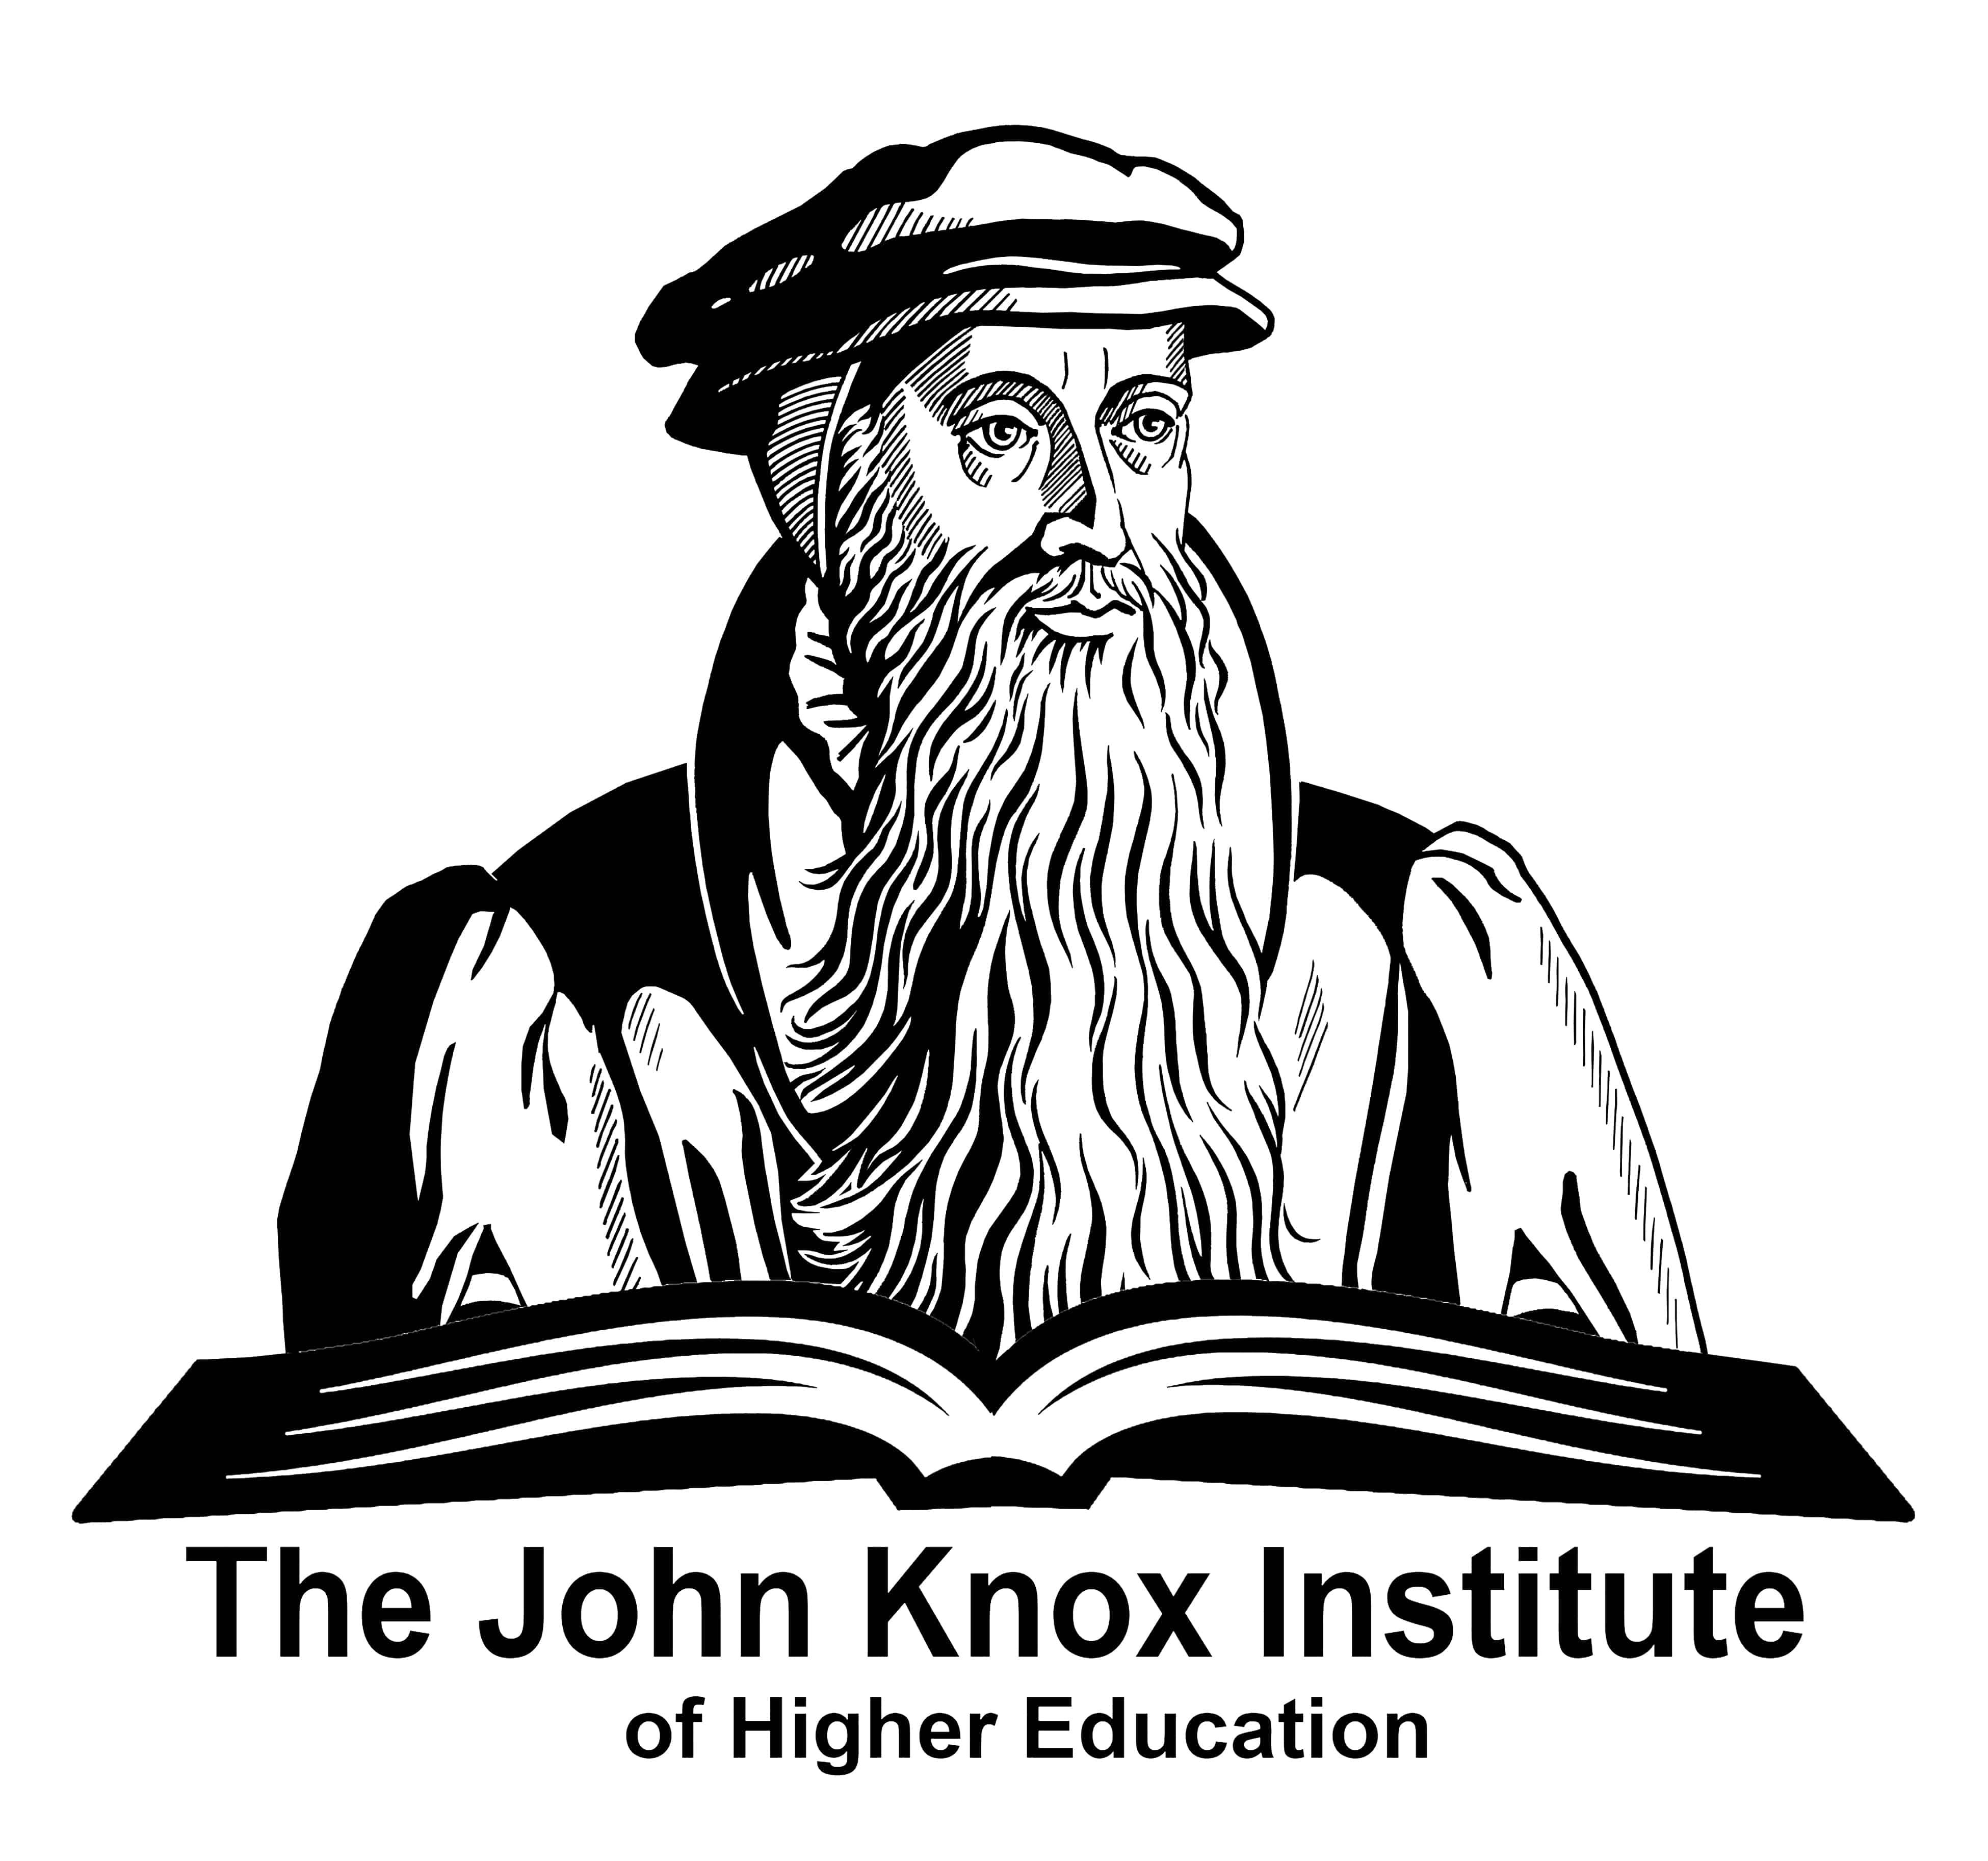 The John Knox Institute